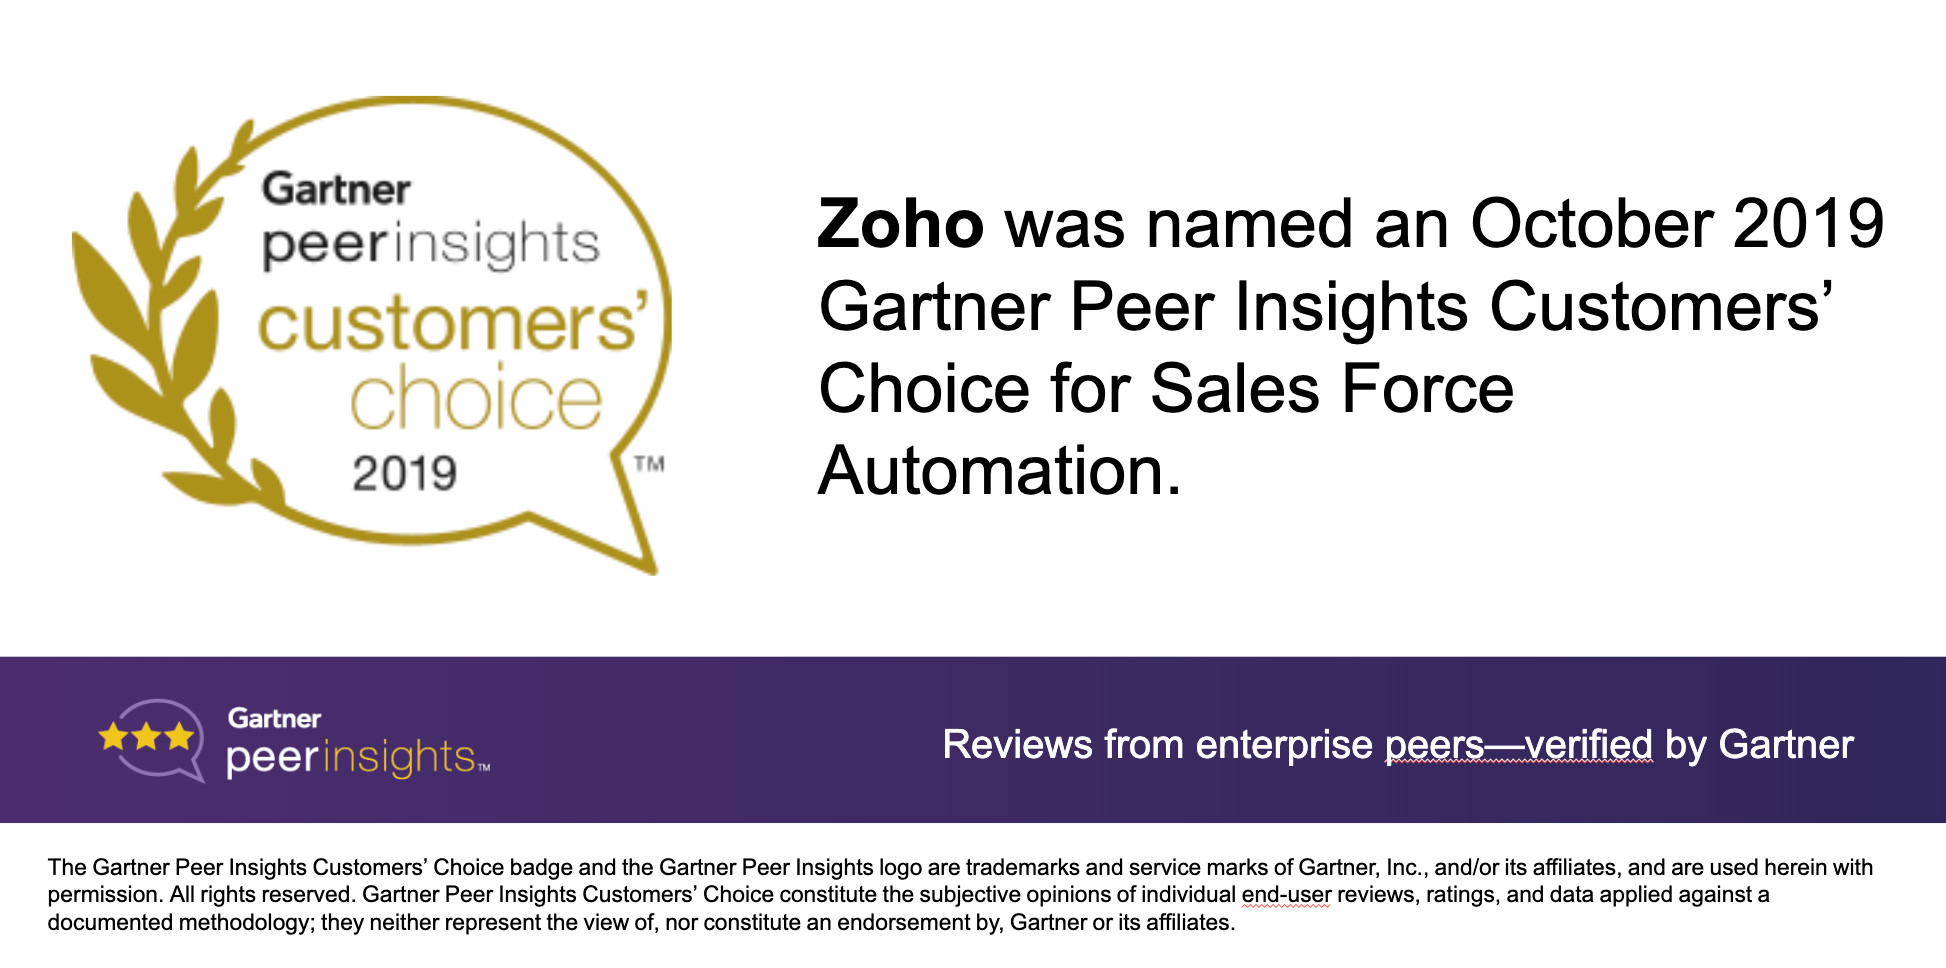 "Zoho CRM荣获10月 Gartner Peer Insights销售自动化类别""客户之选""称号"